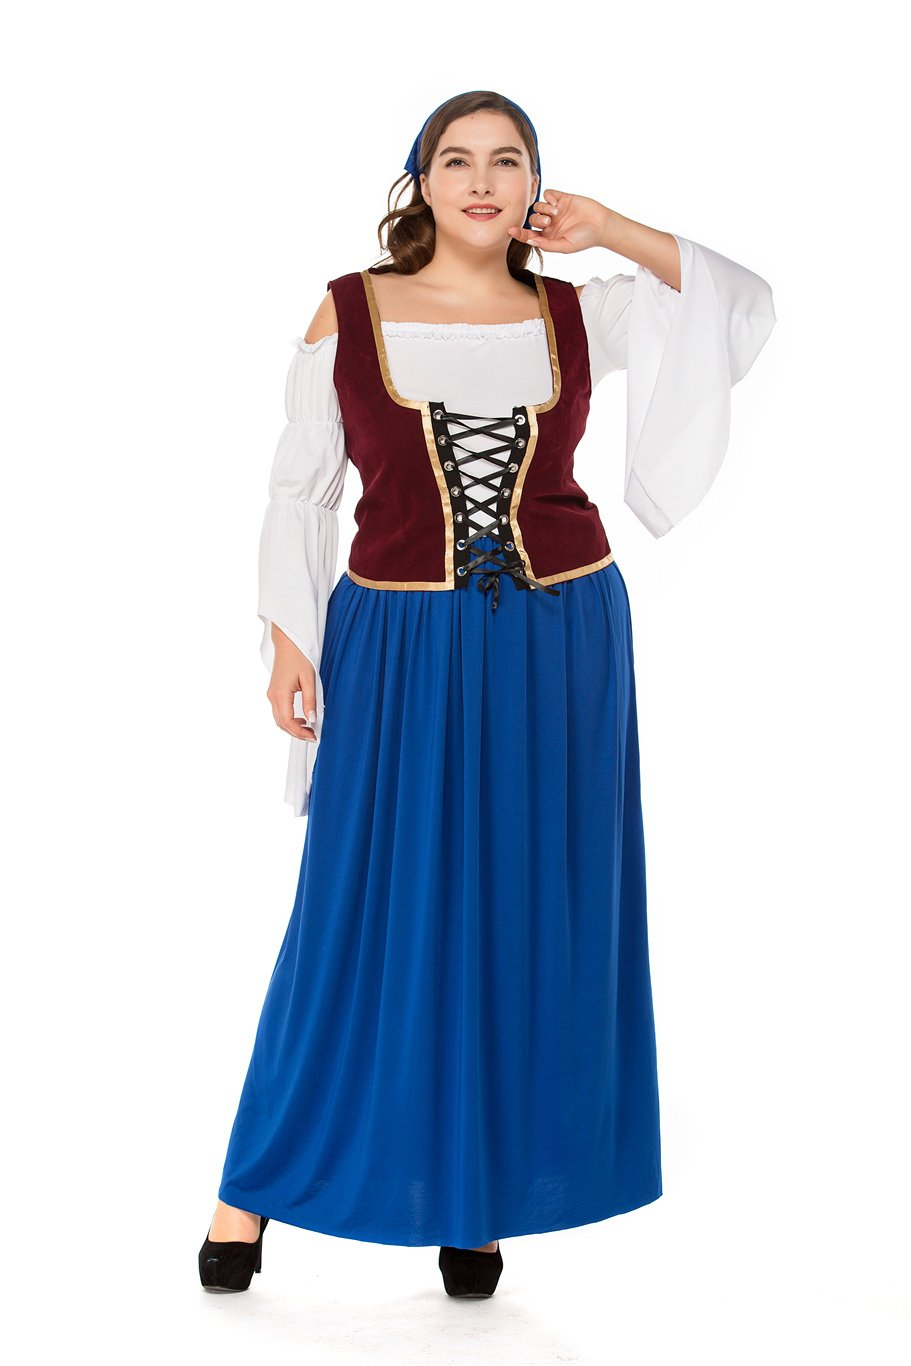 Plus Size German Women Oktoberfest Dress Mardi Gras Blue Cosplay Bavarian Waitress Costume